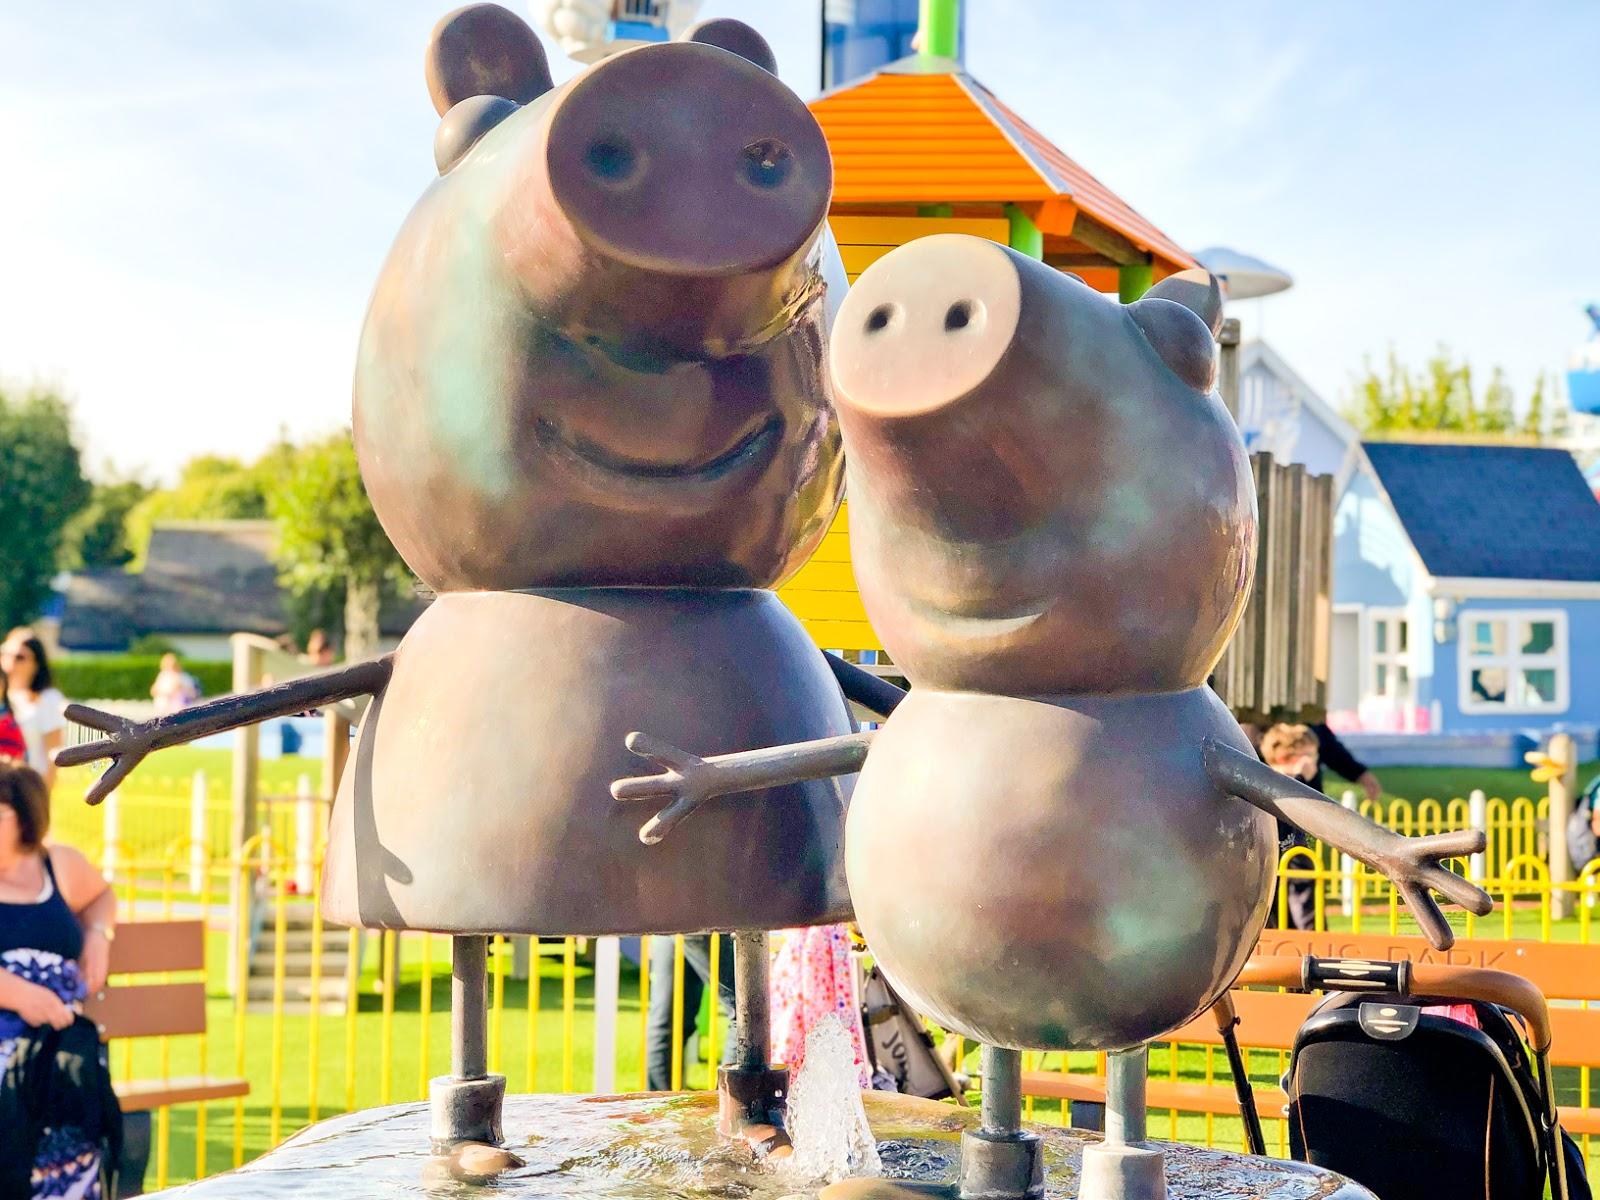 peppa pig world, peppa pig, paultons park, peppa pig world review